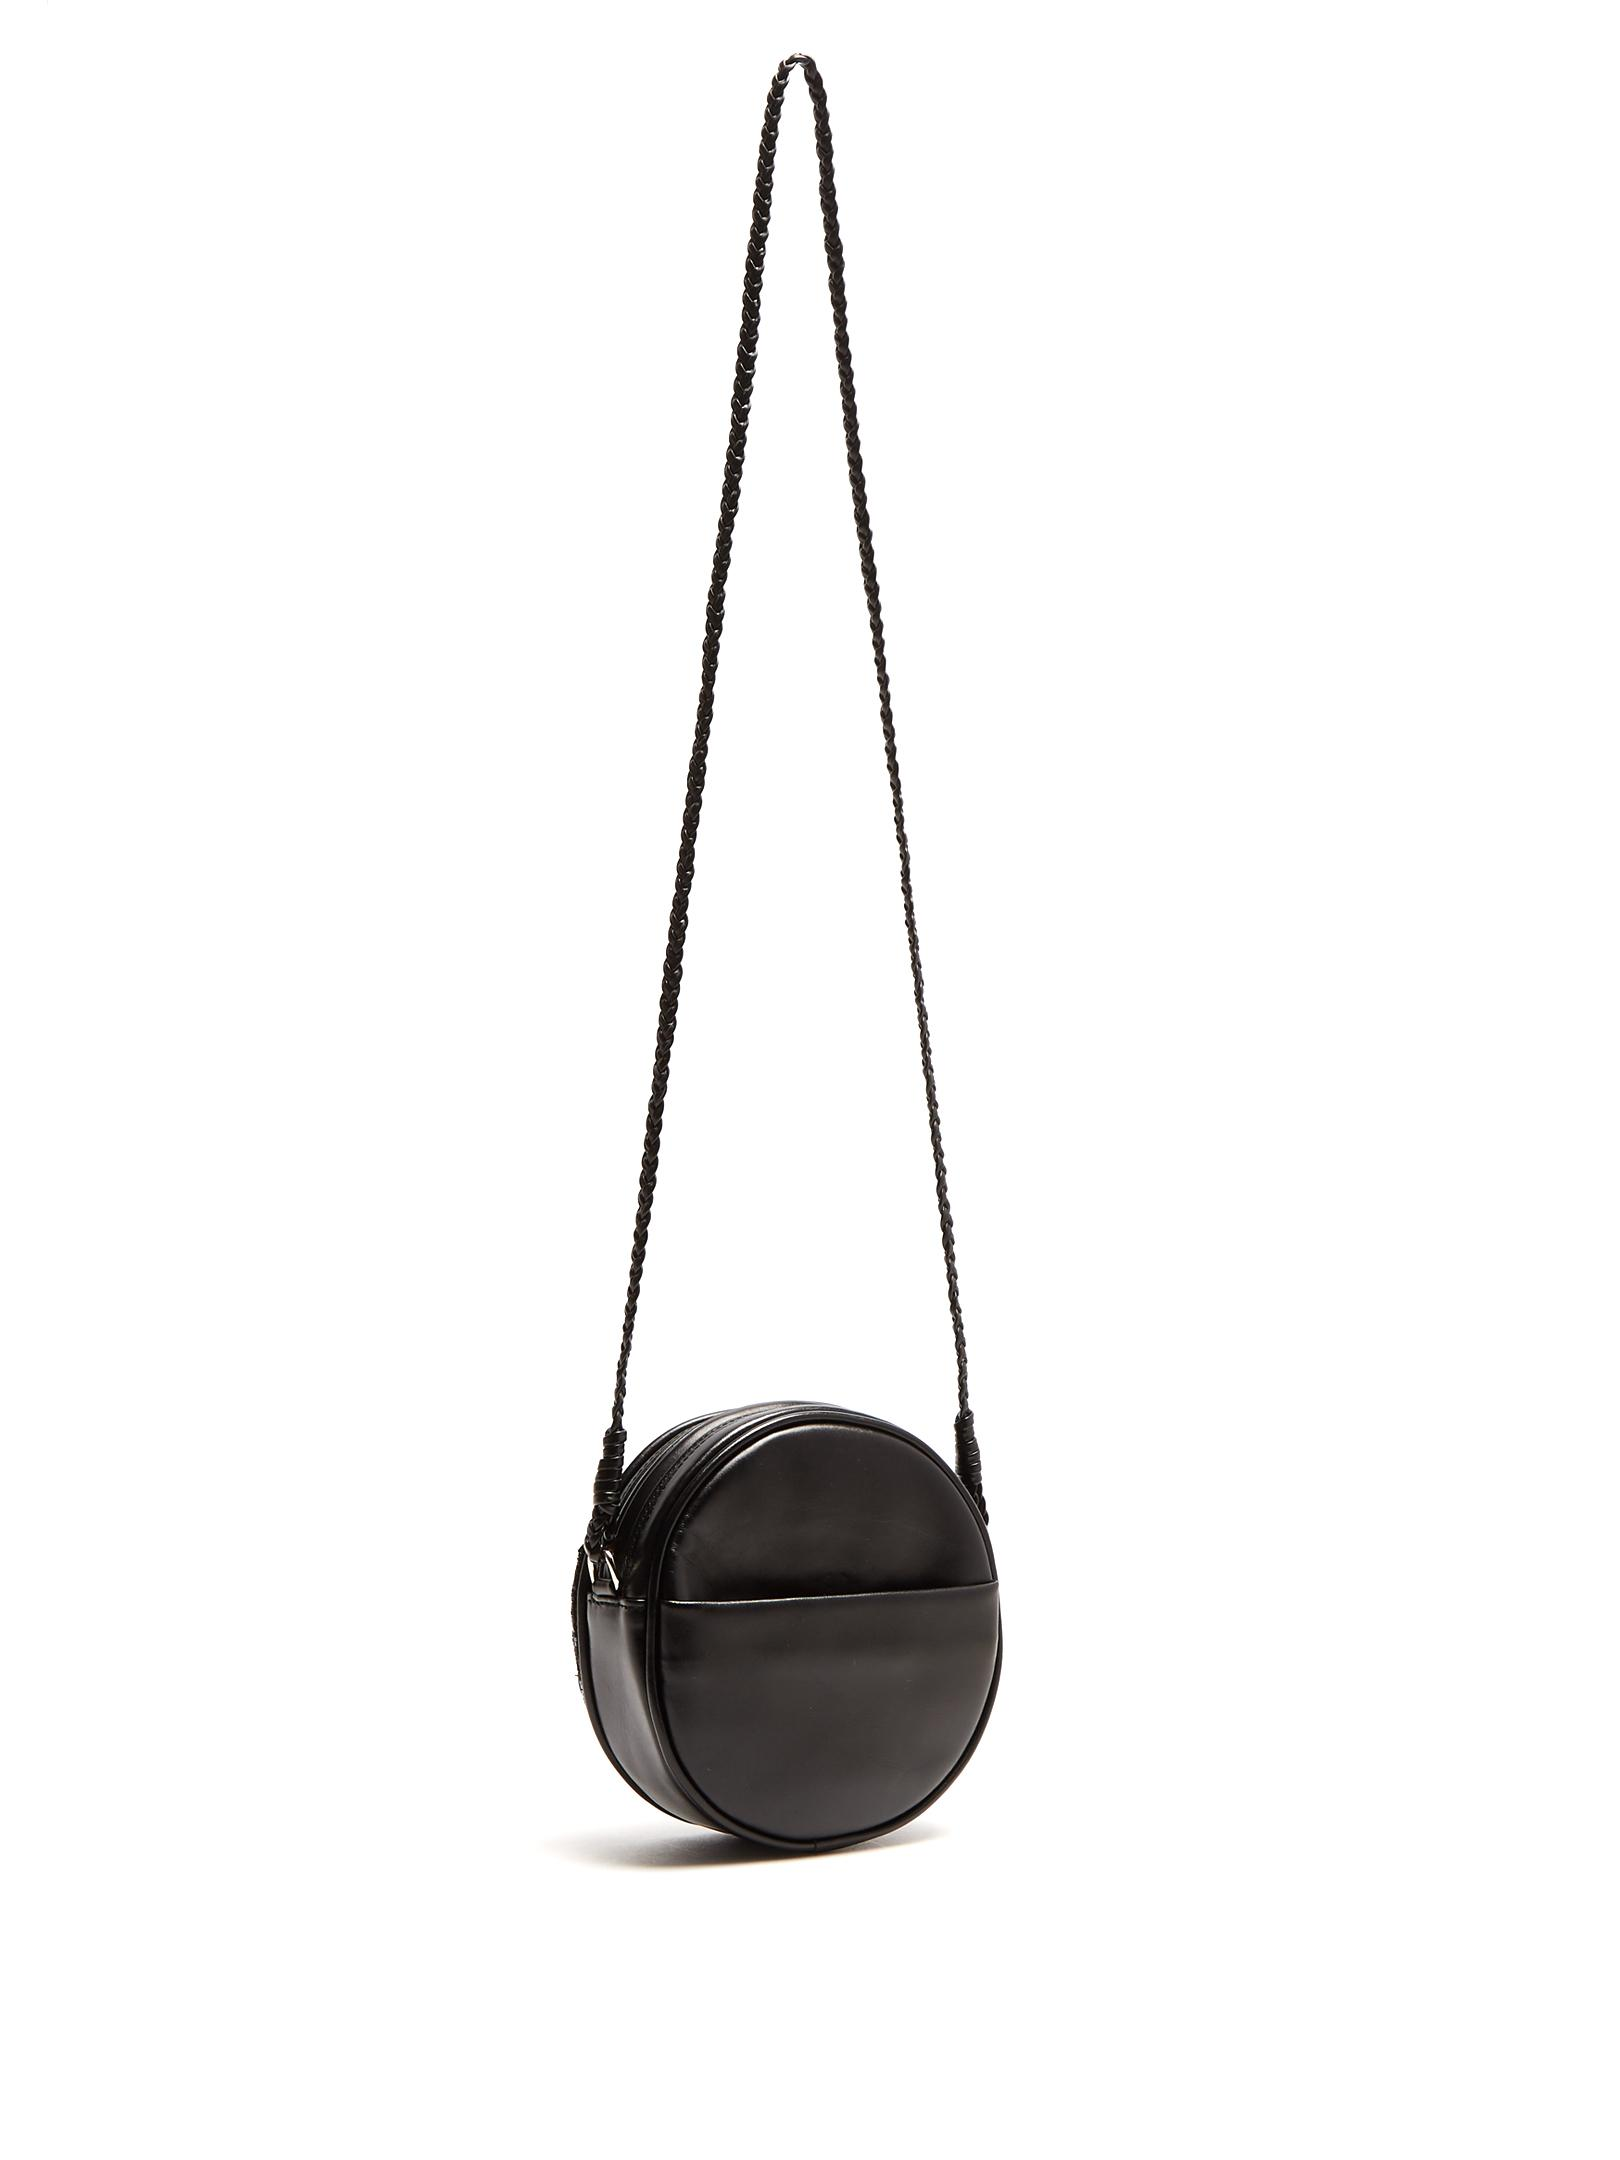 Sarah's Bag Leather Black Magic Woman Crossbody Bag